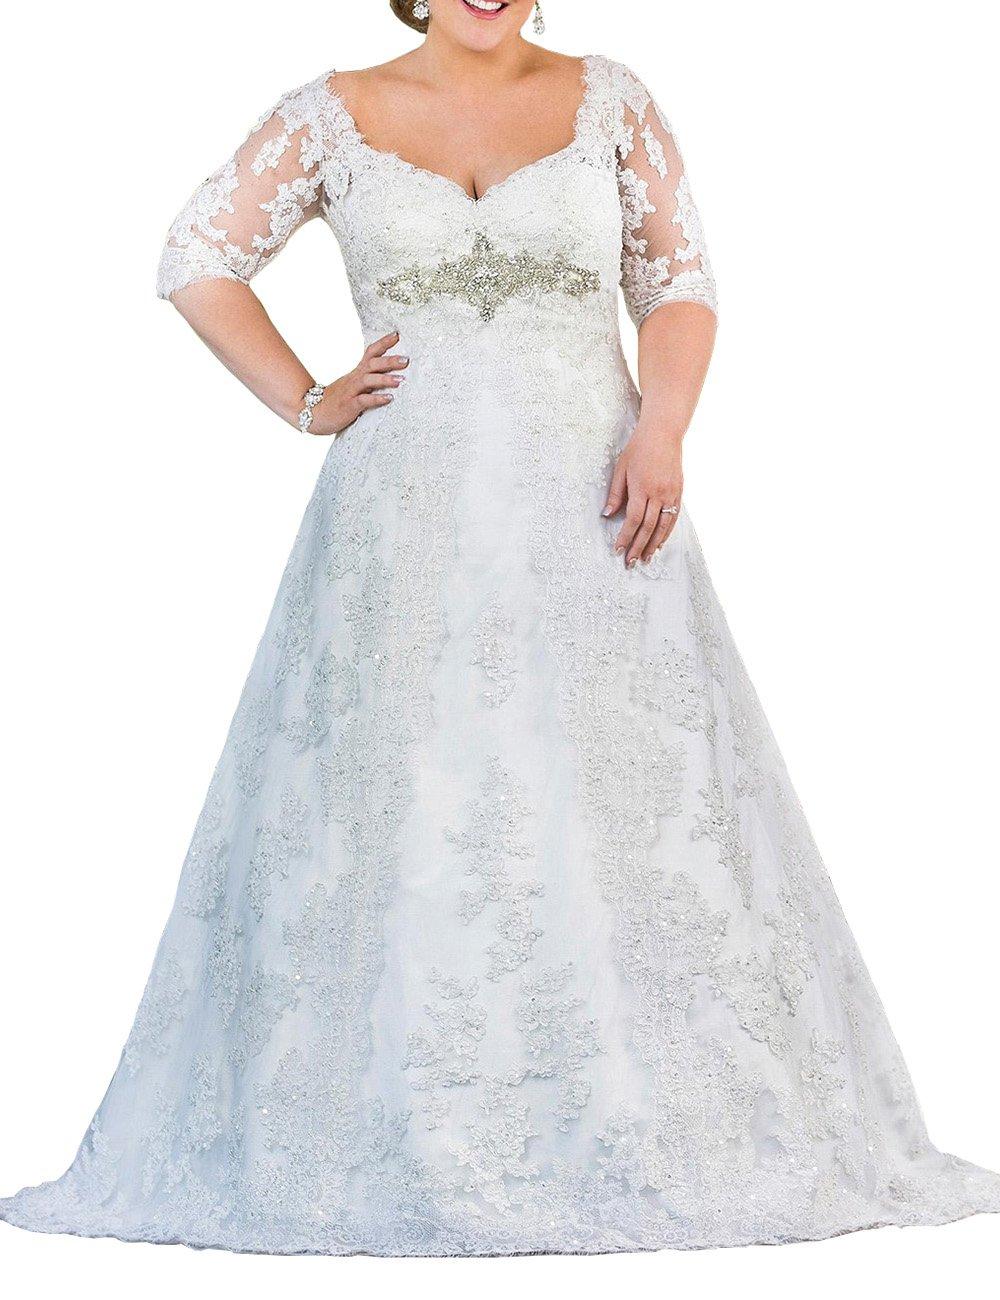 Mulanbridal Women's V-neck Plus Size Wedding Dresses for Bride Lace Applique Bridal Gowns Ivory 22